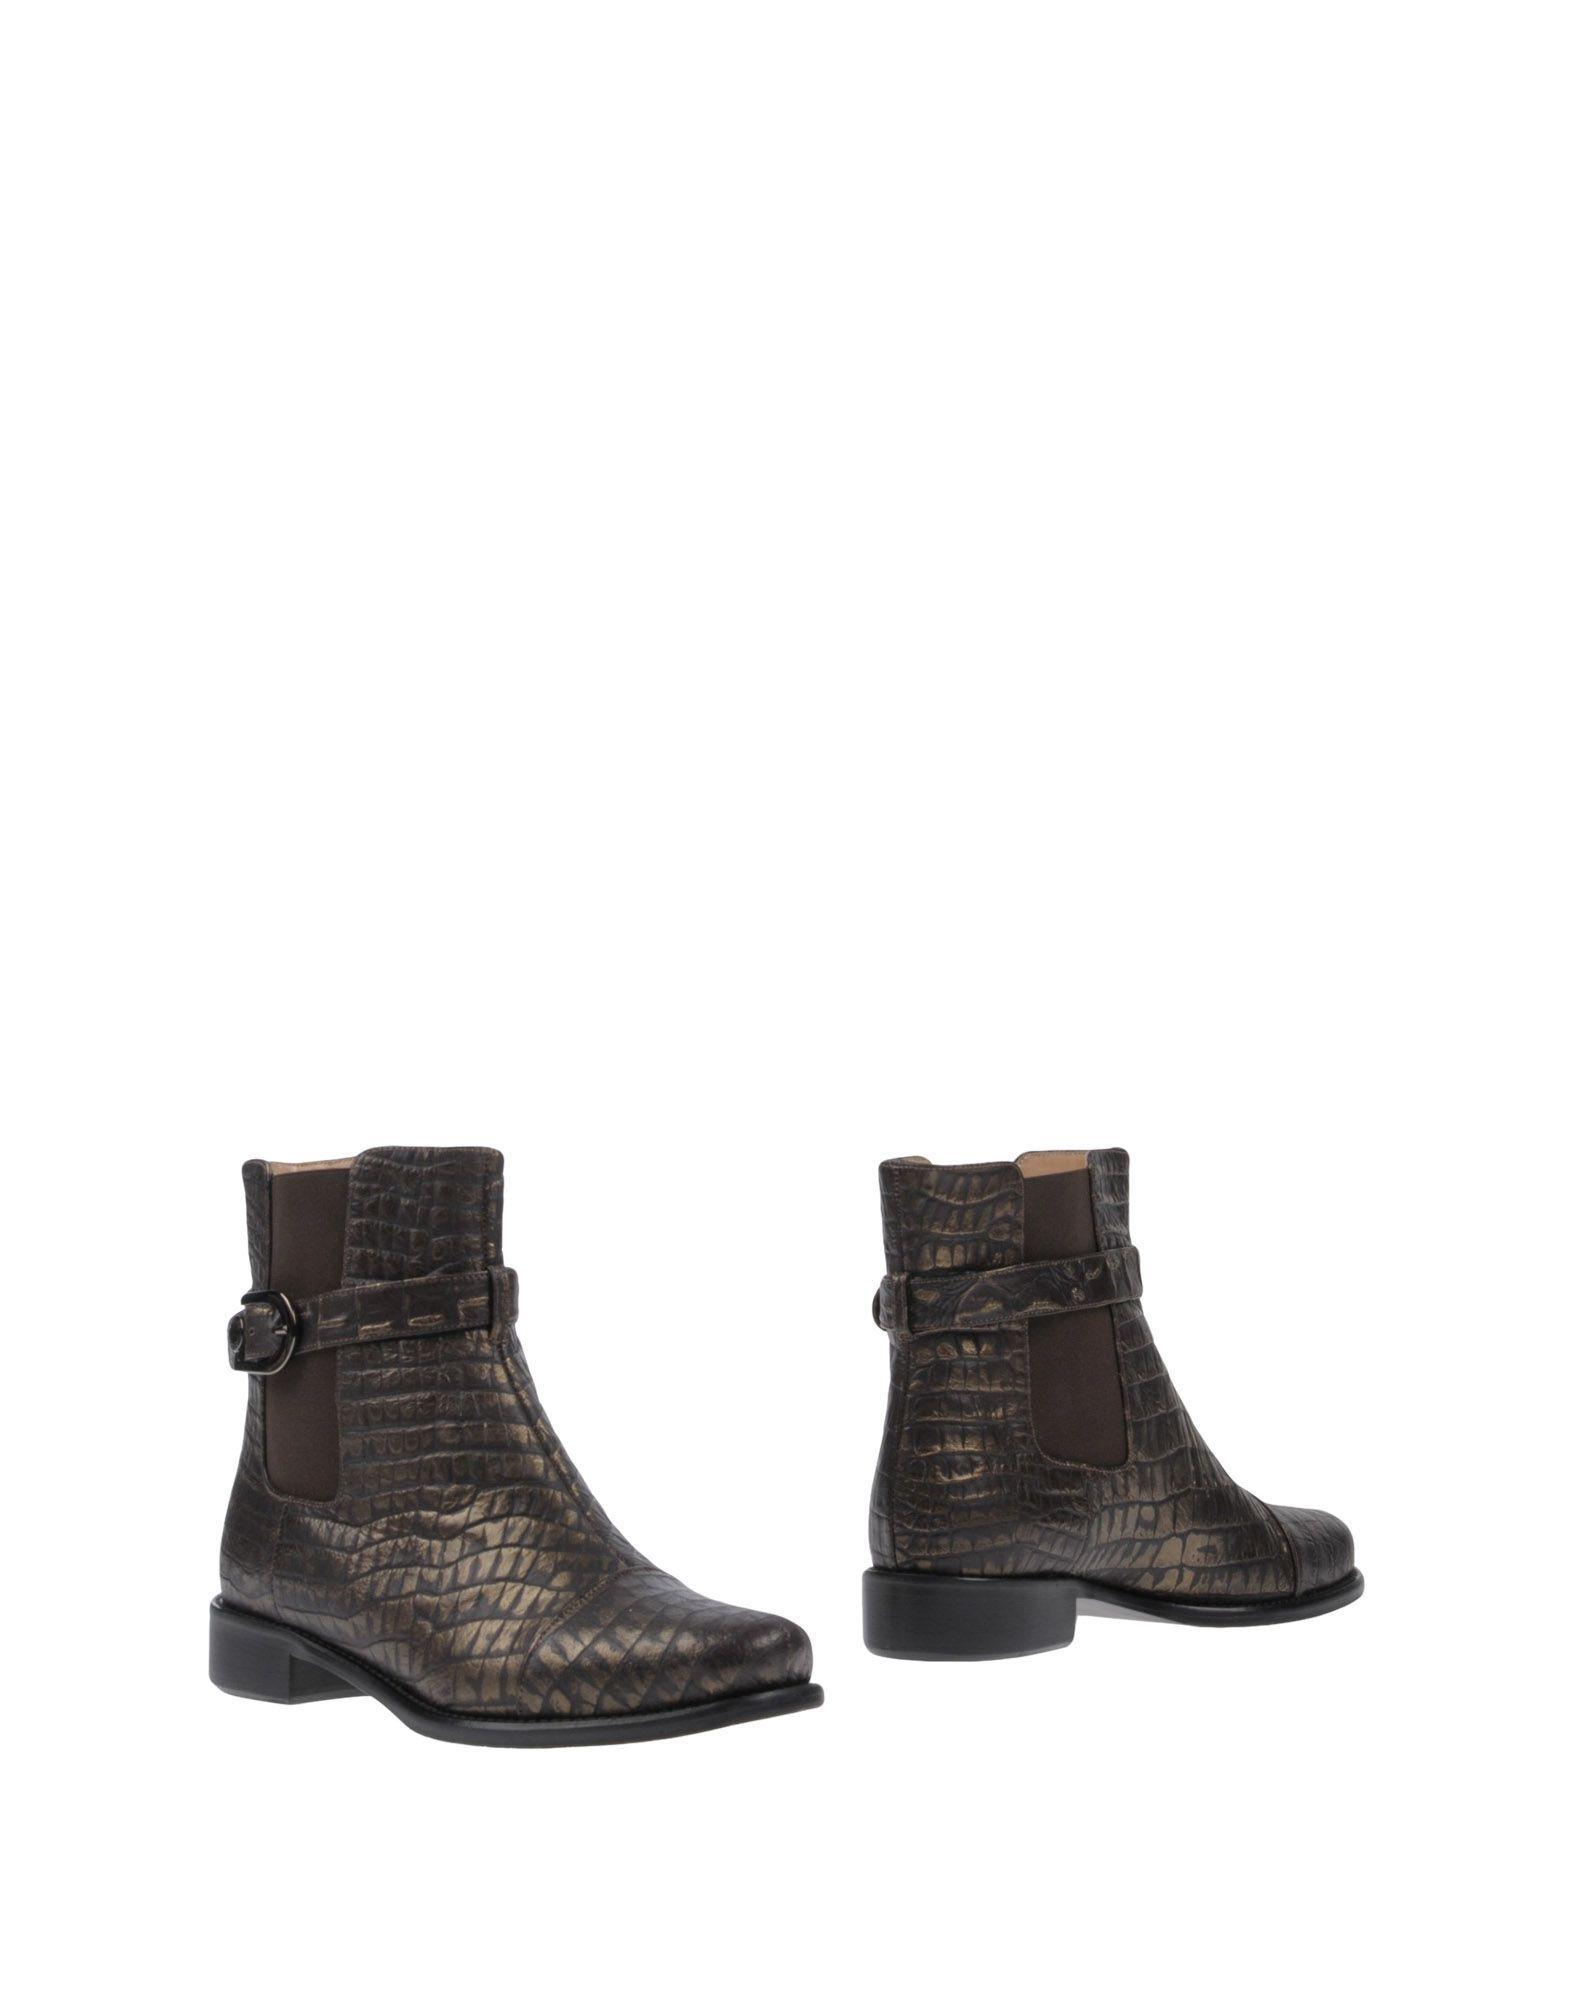 Dibrera By Paolo Zanoli Ankle Boot - Women Dibrera By online Paolo Zanoli Ankle Boots online By on  Australia - 11447034UD 4d4d3a